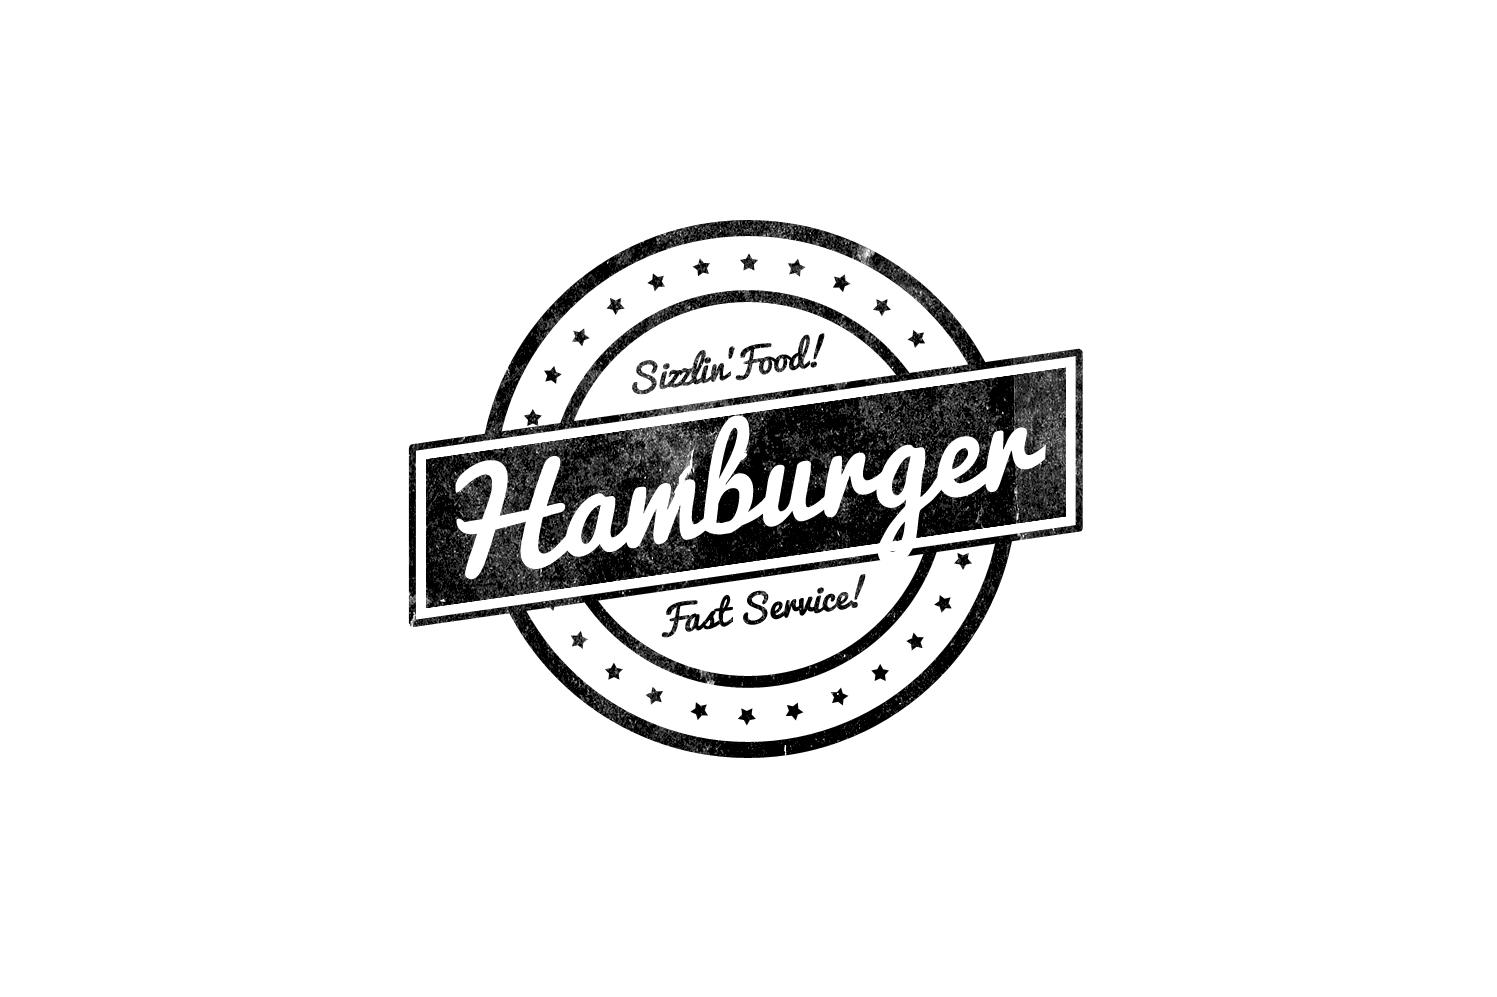 vintage logo template - Google Search | Food & recipes | Pinterest ...